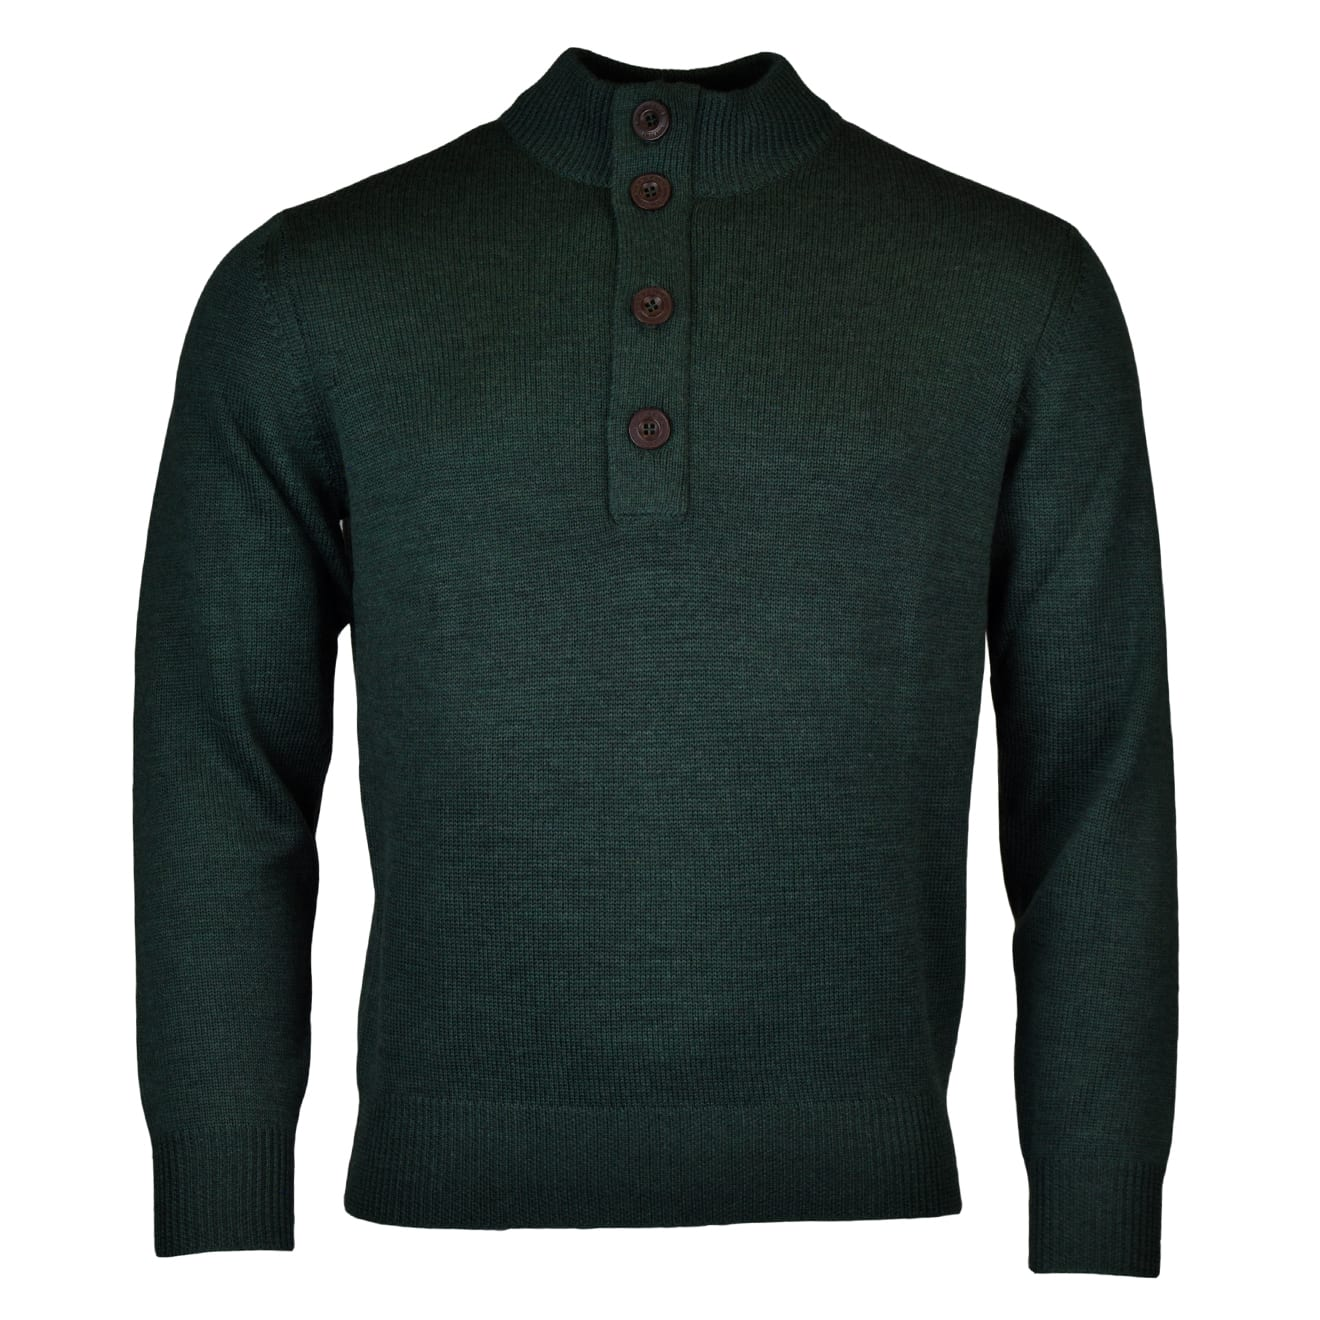 Alan Paine tain button half zip mock knit hunter 2